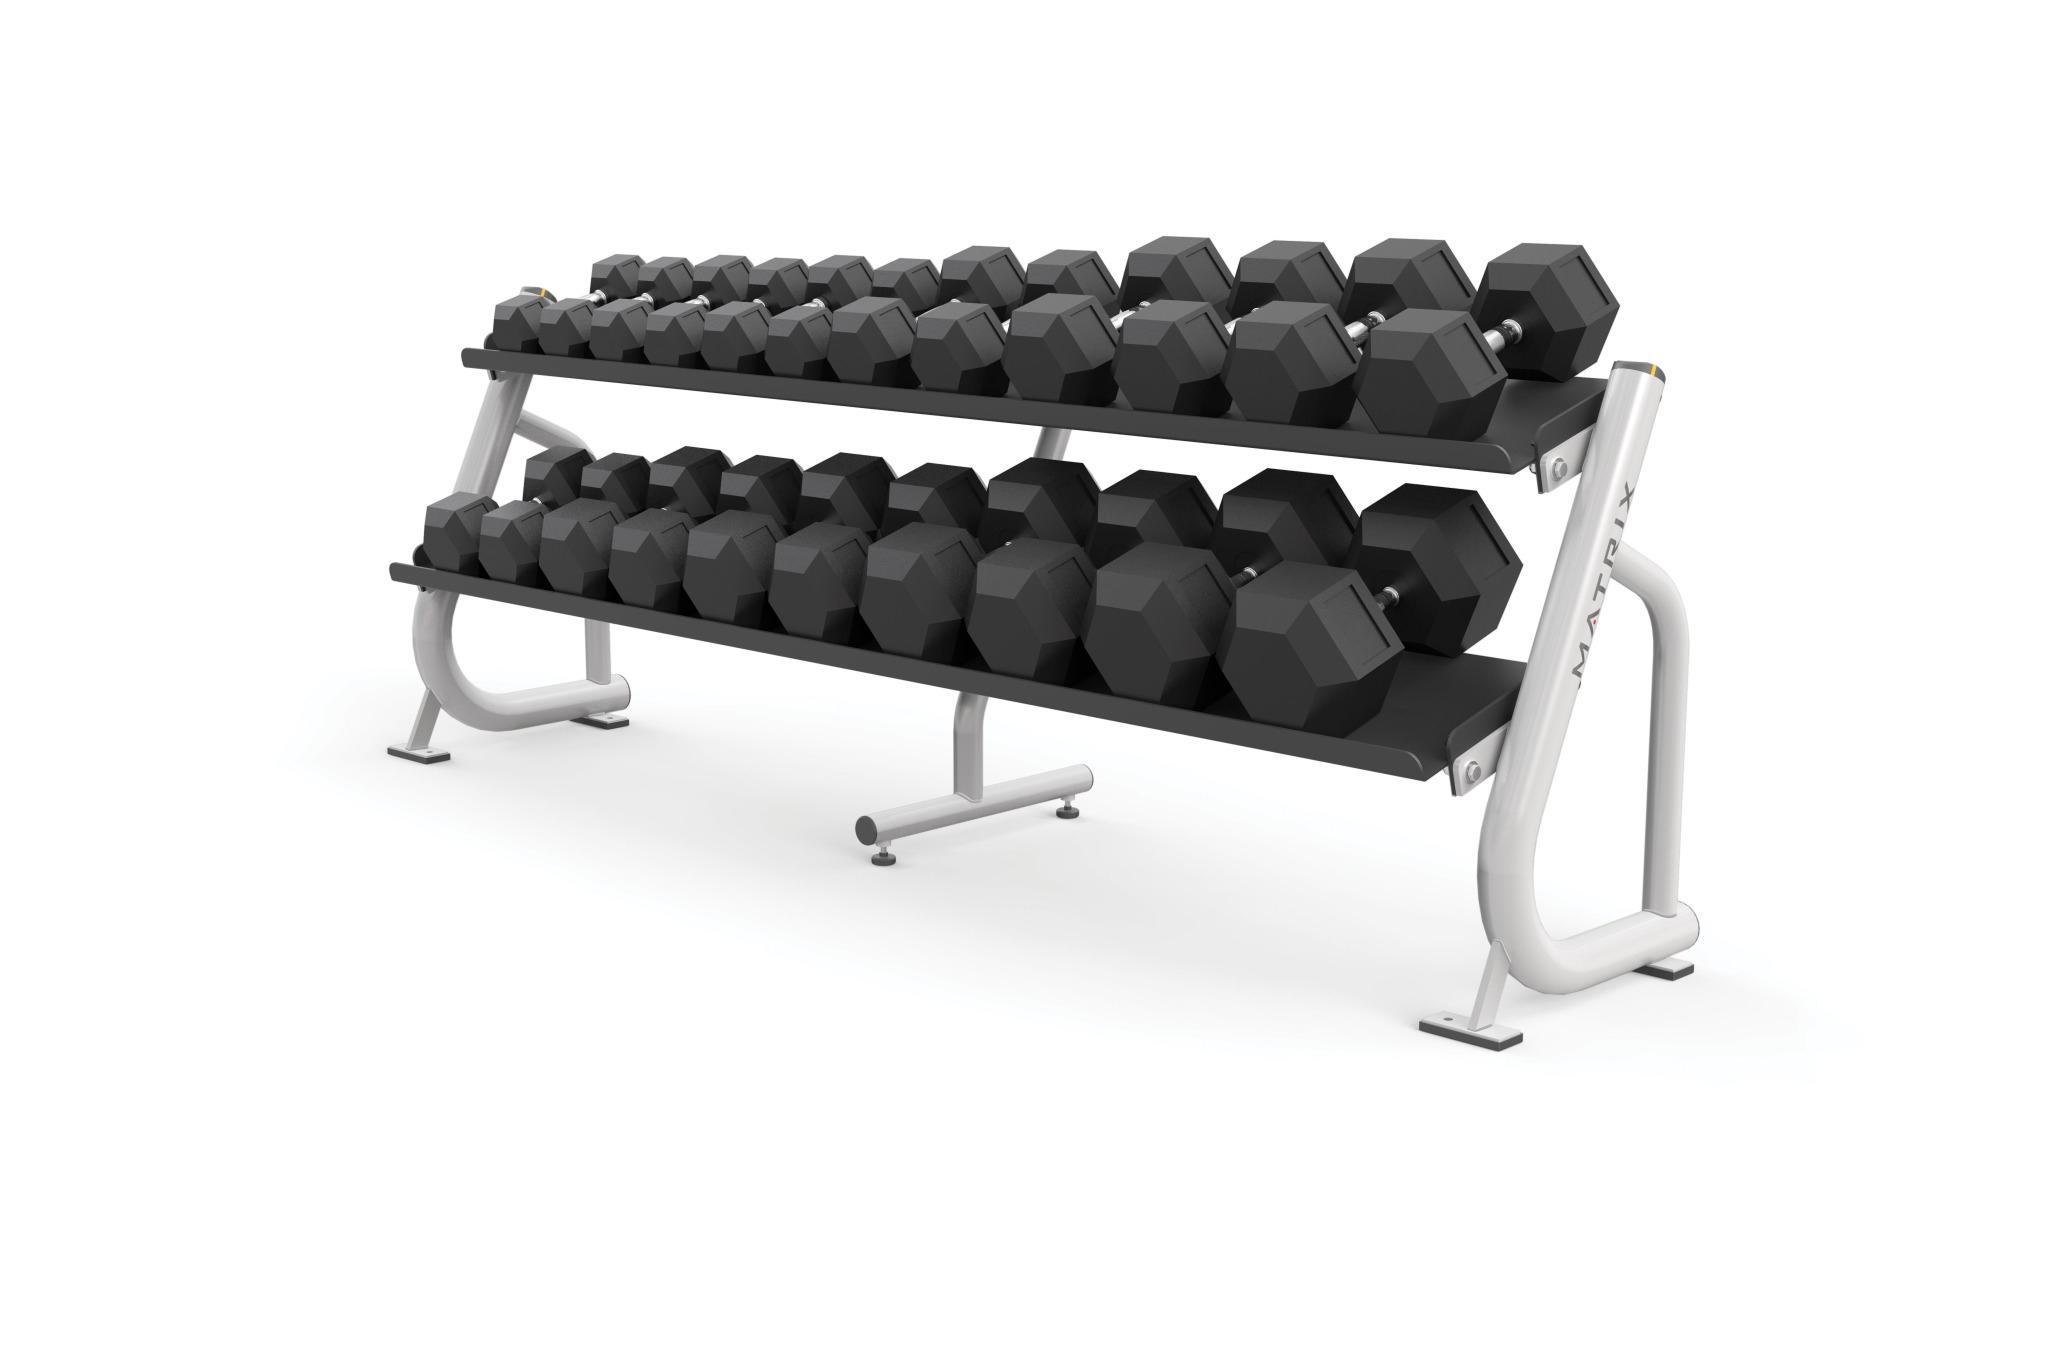 2-tier Flat-tray Dumbbell Rack